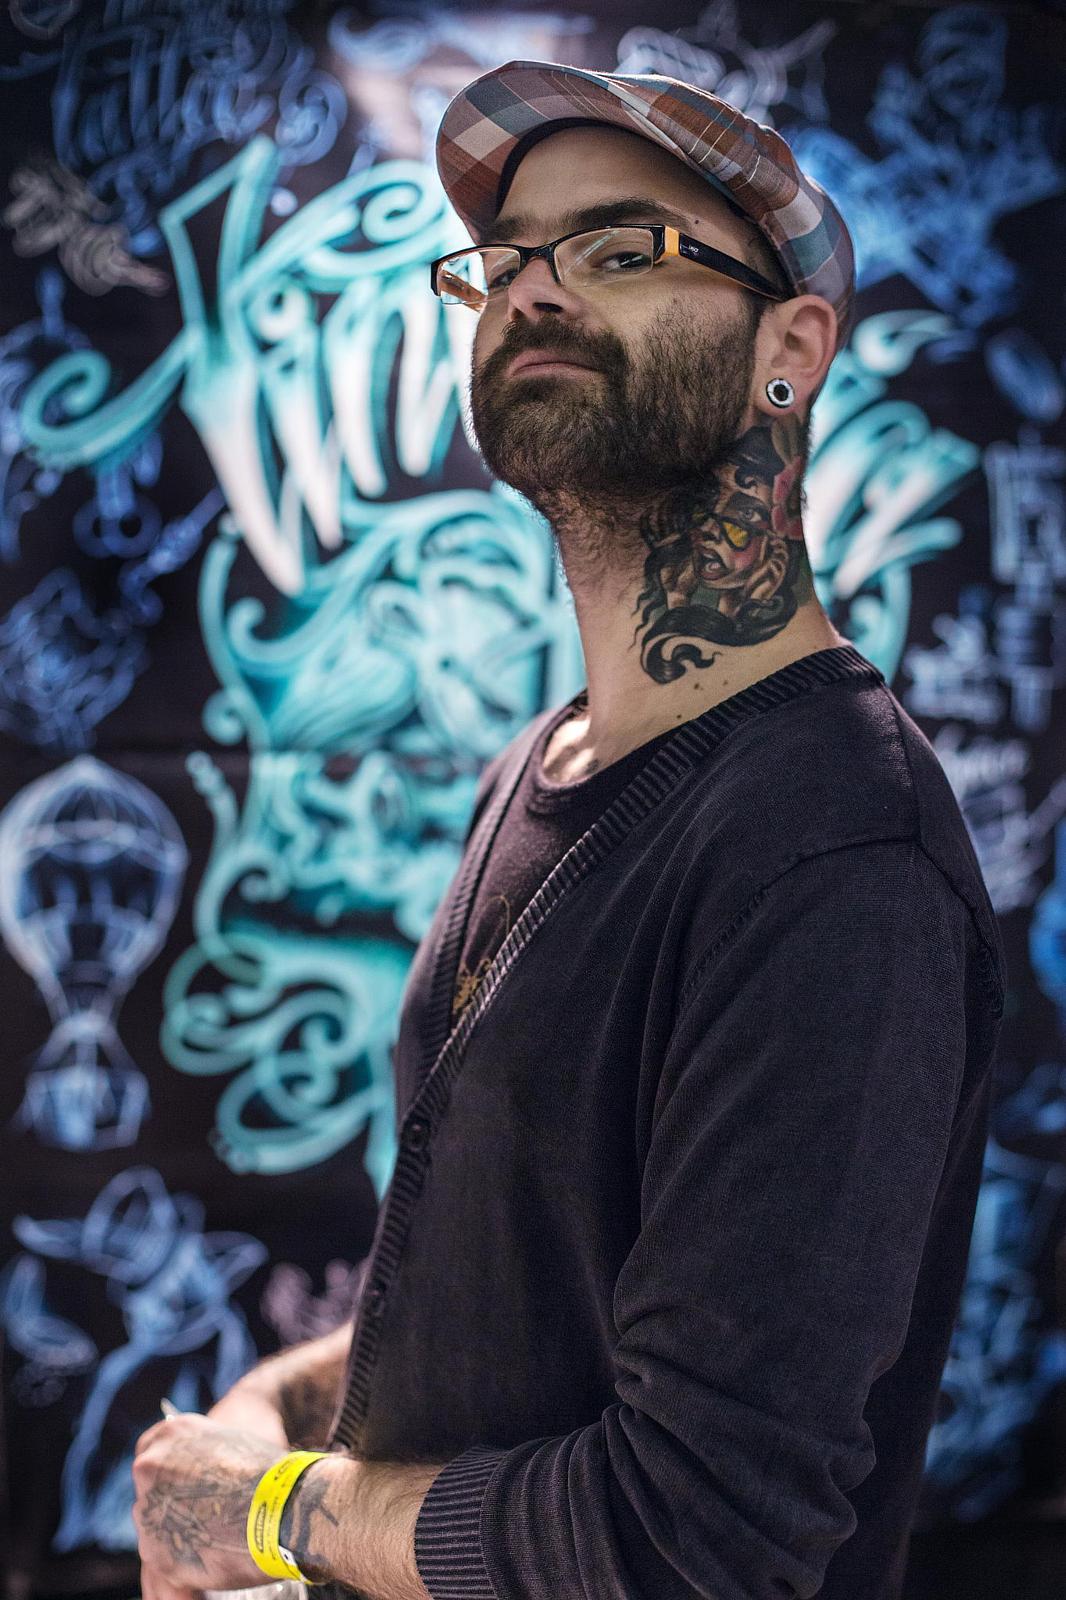 beard_16